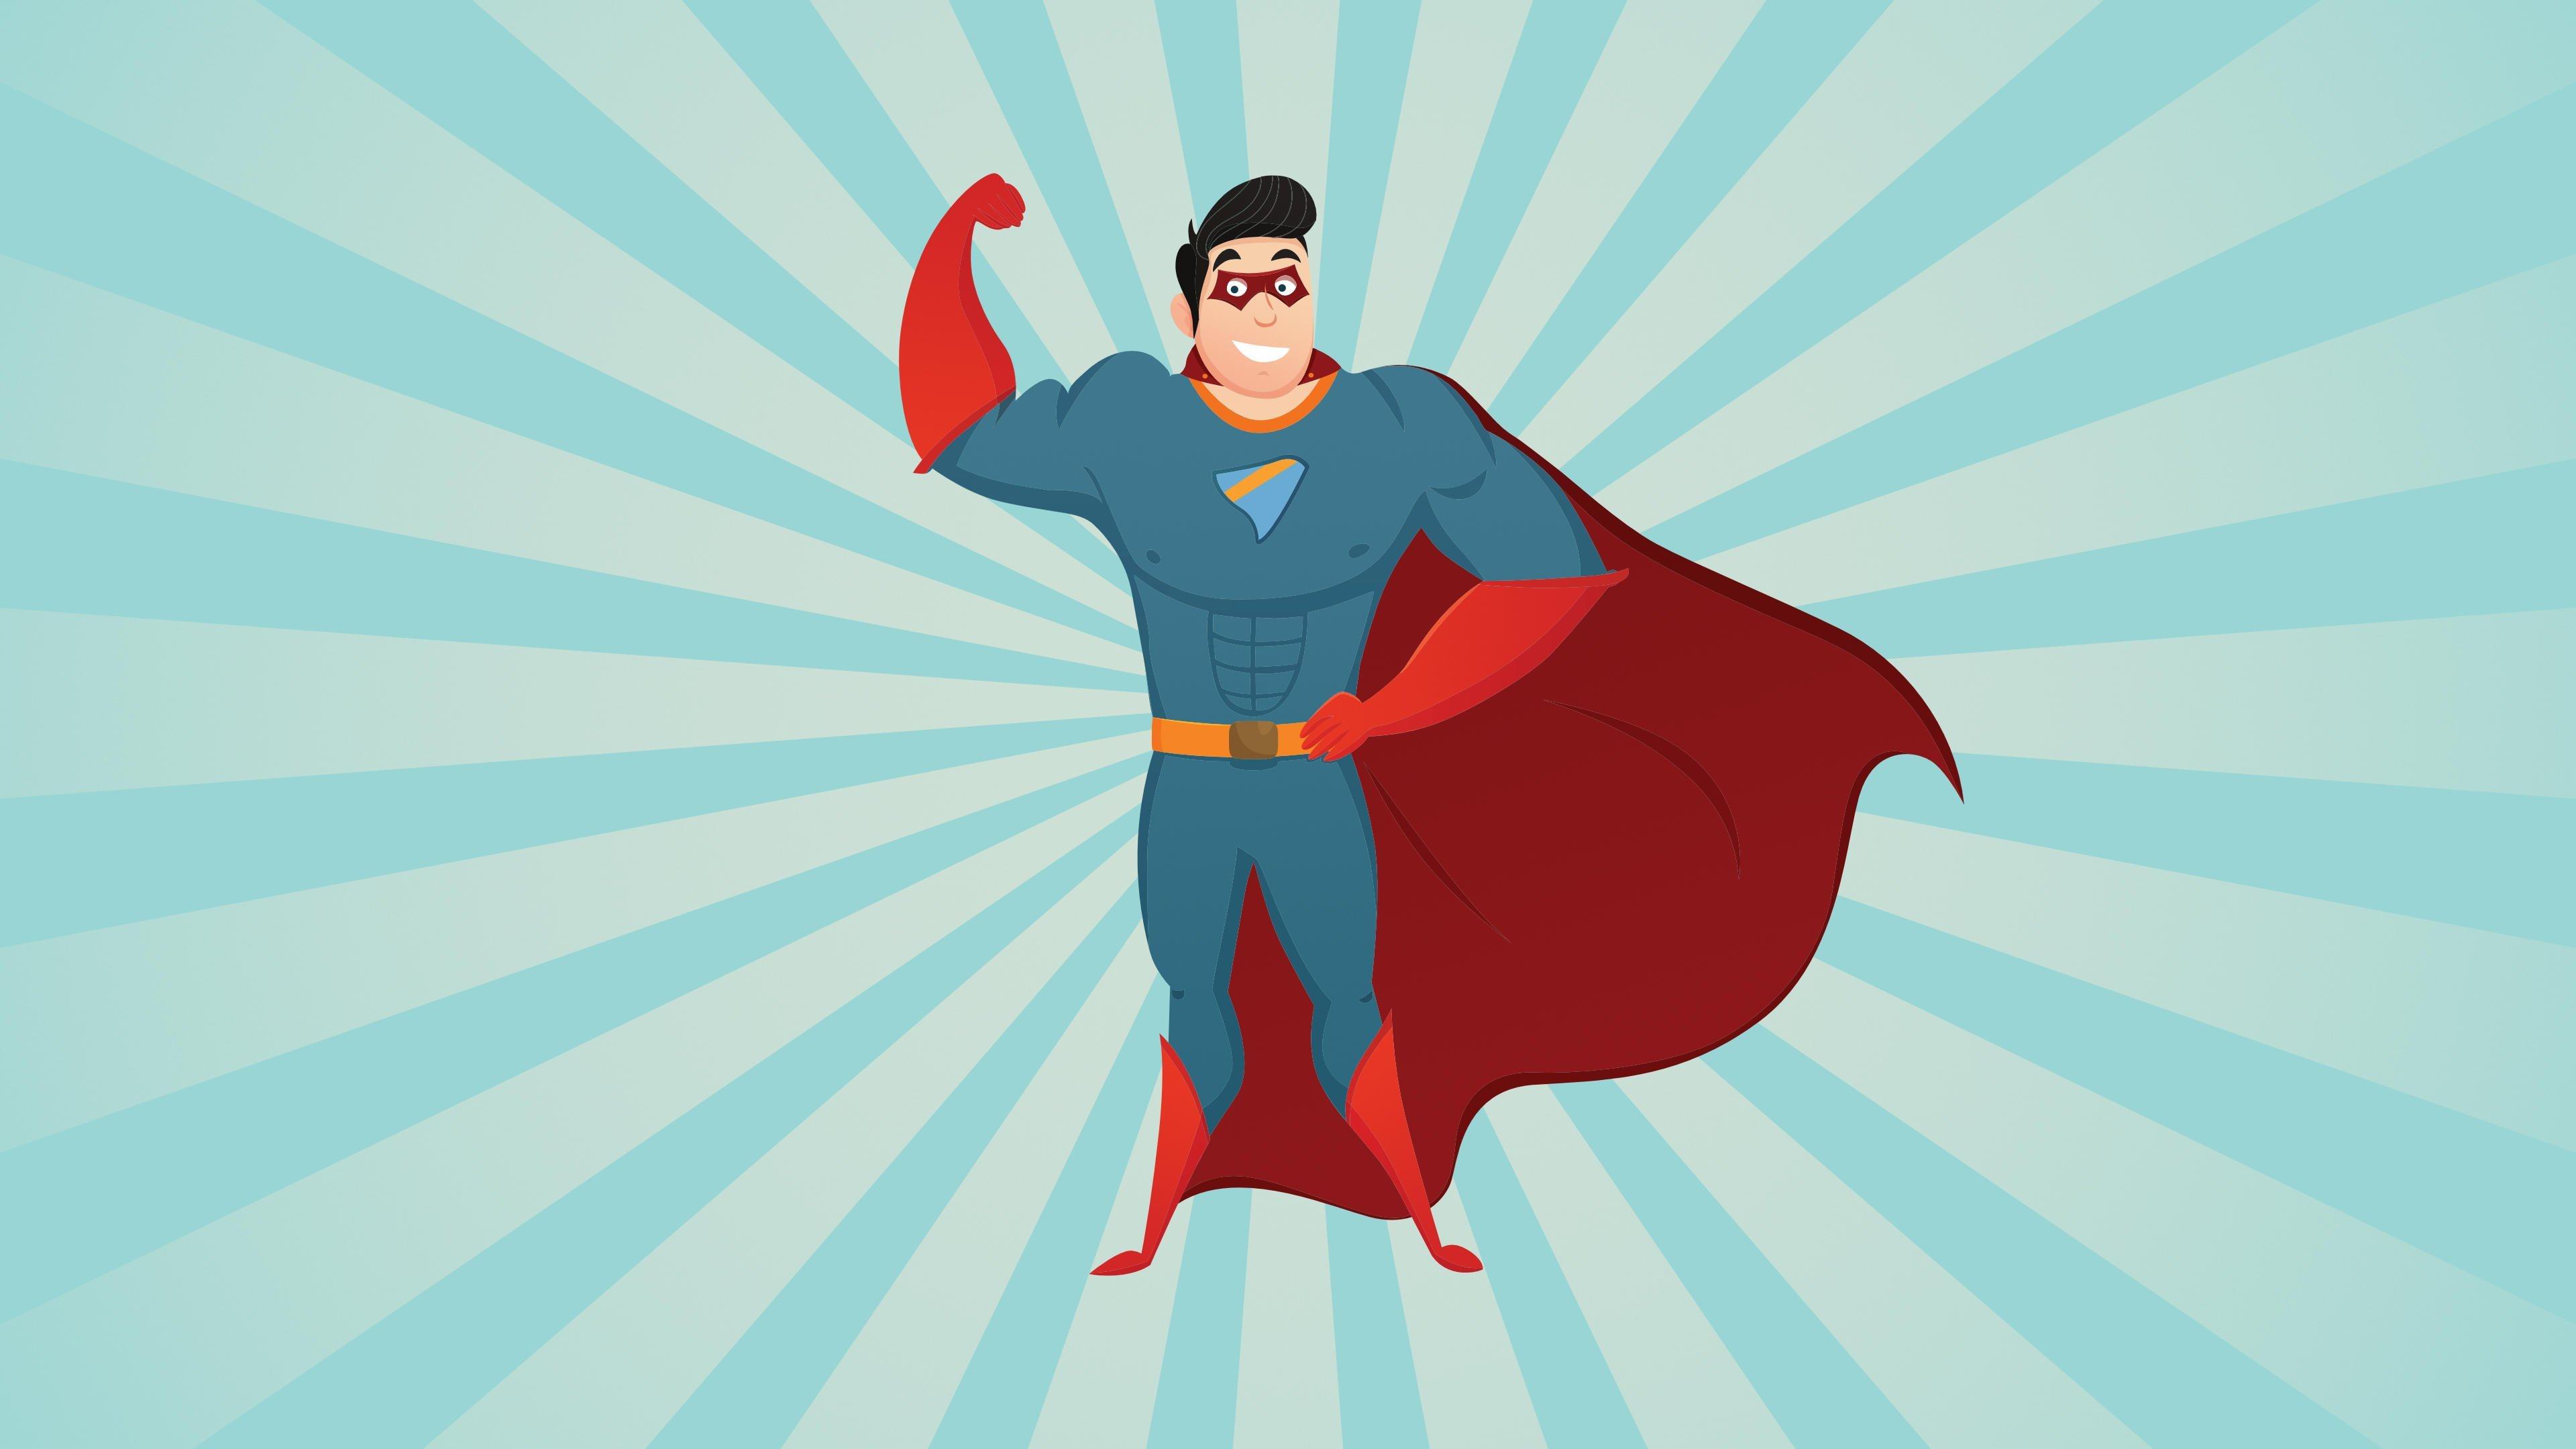 Affinity Designer 1.8 From Zero To Superhero